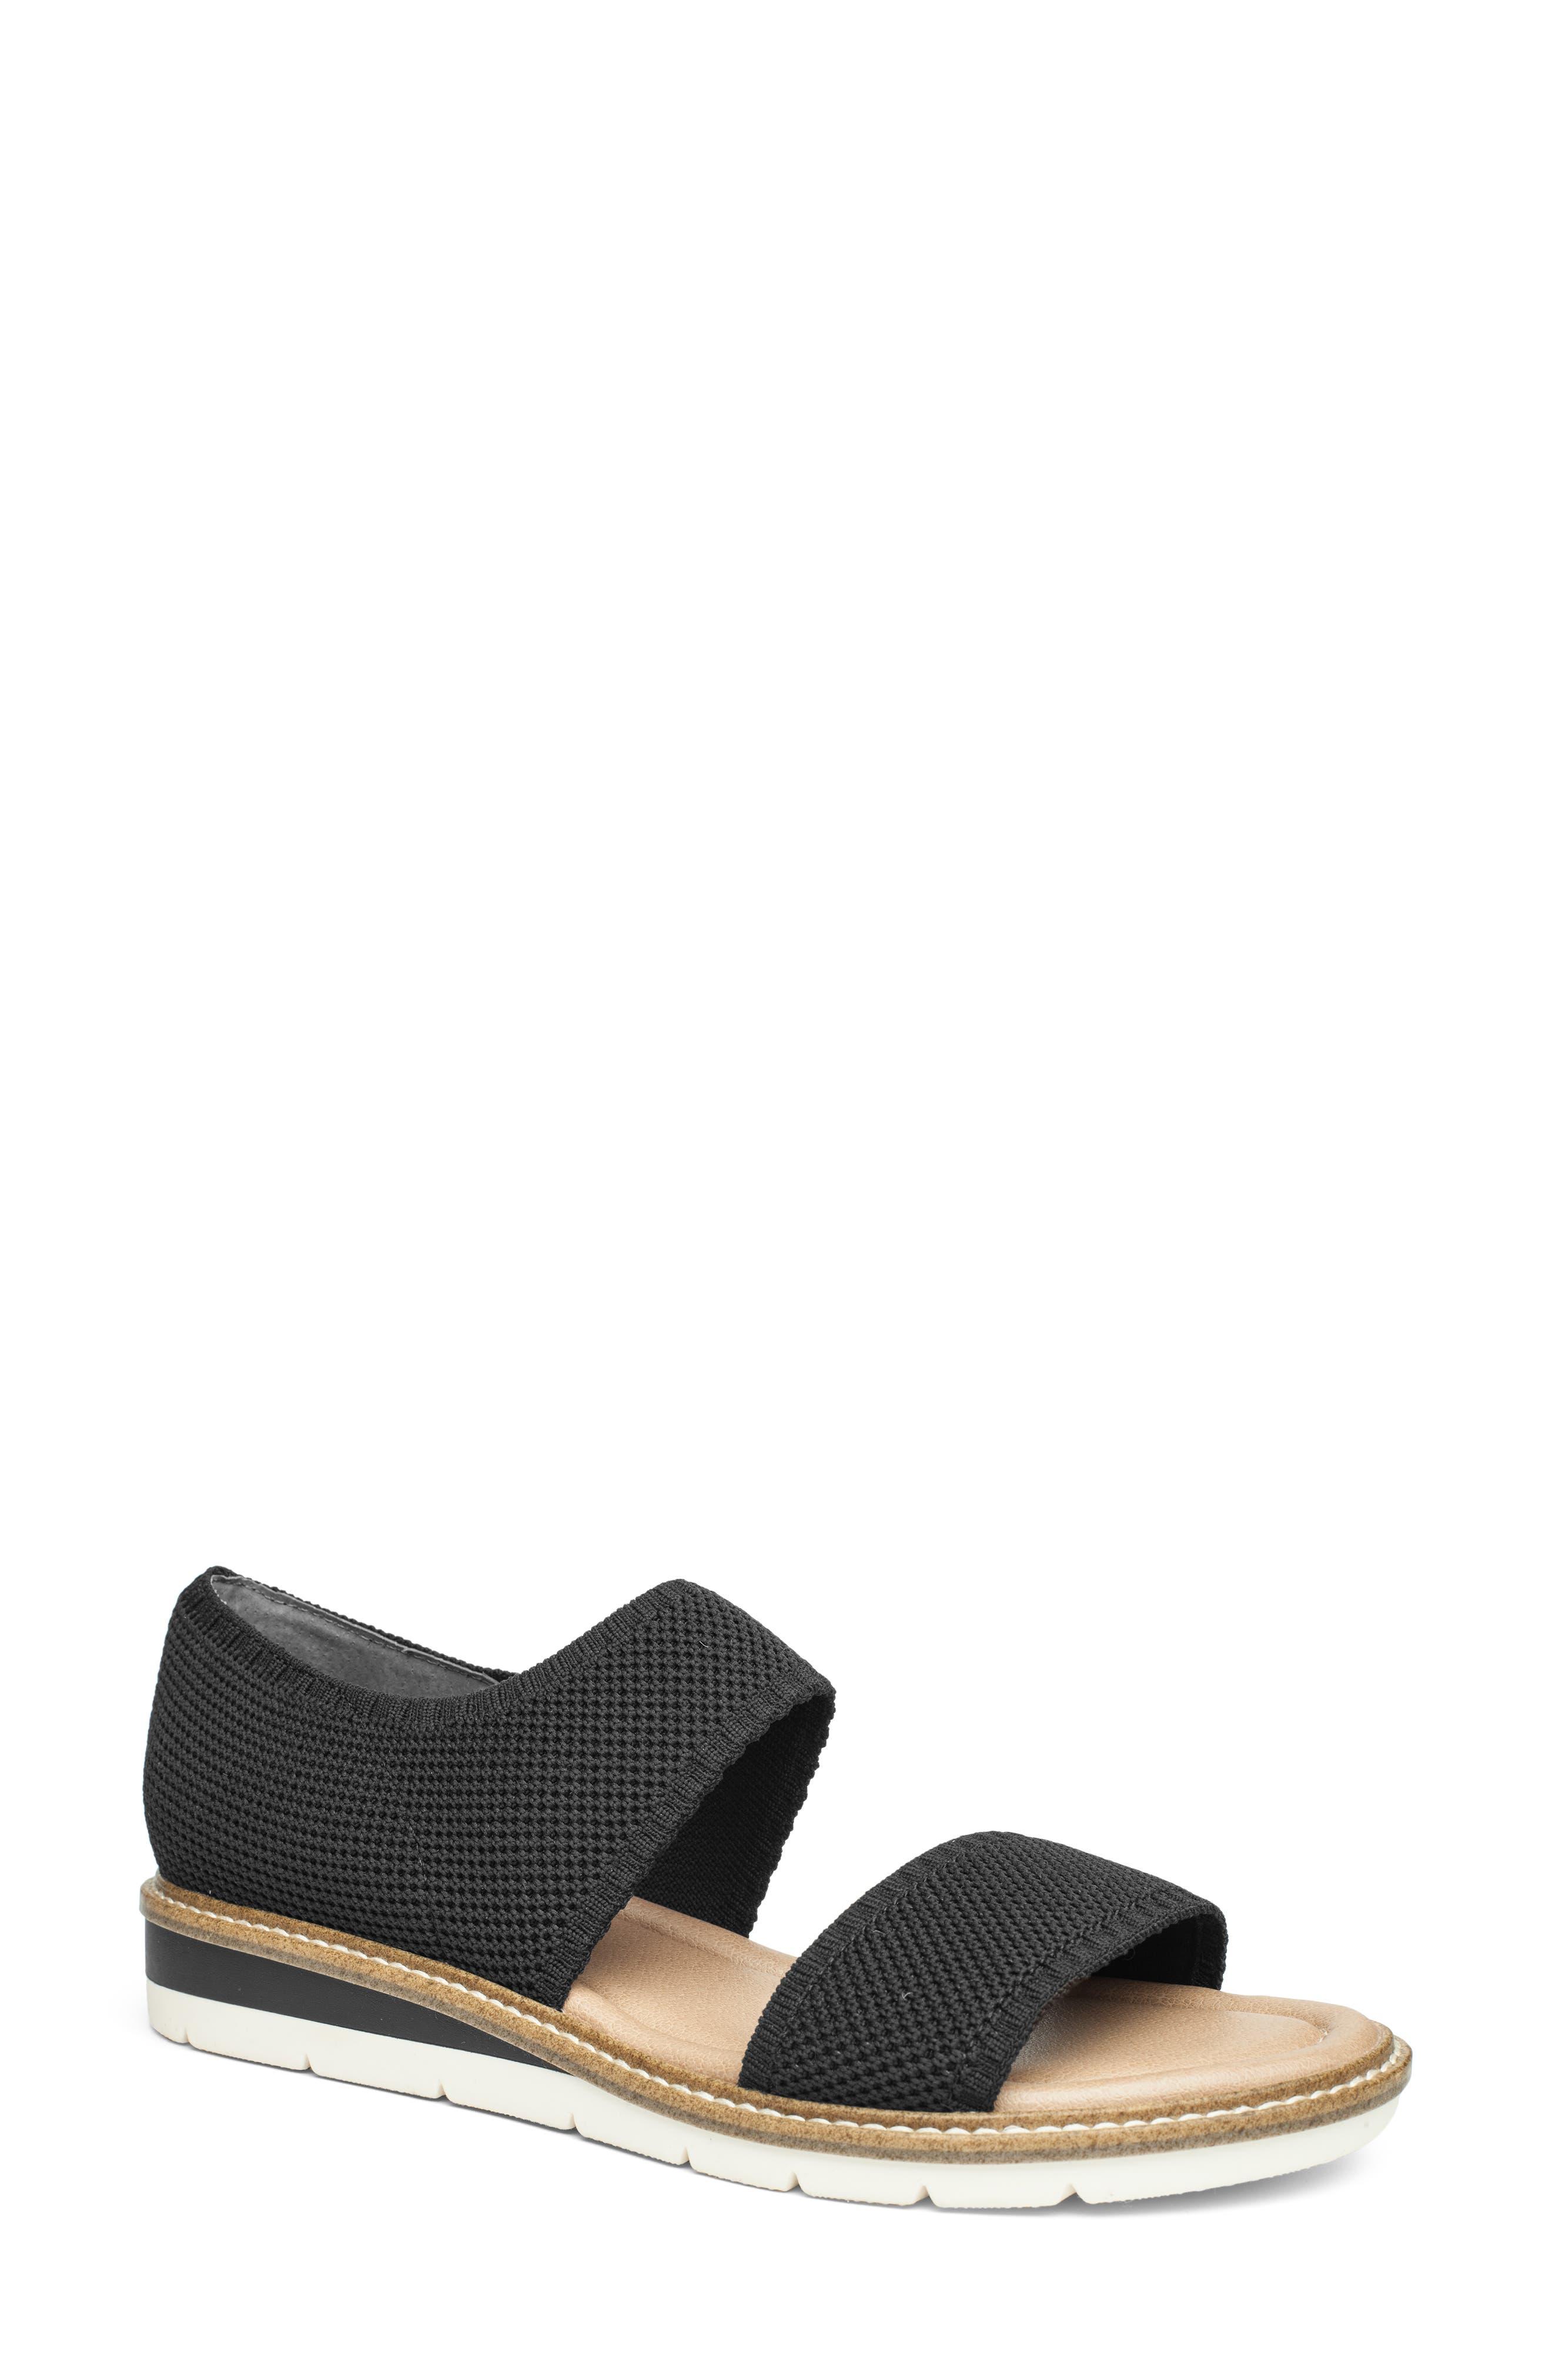 Amity Wedge Knit Sandal